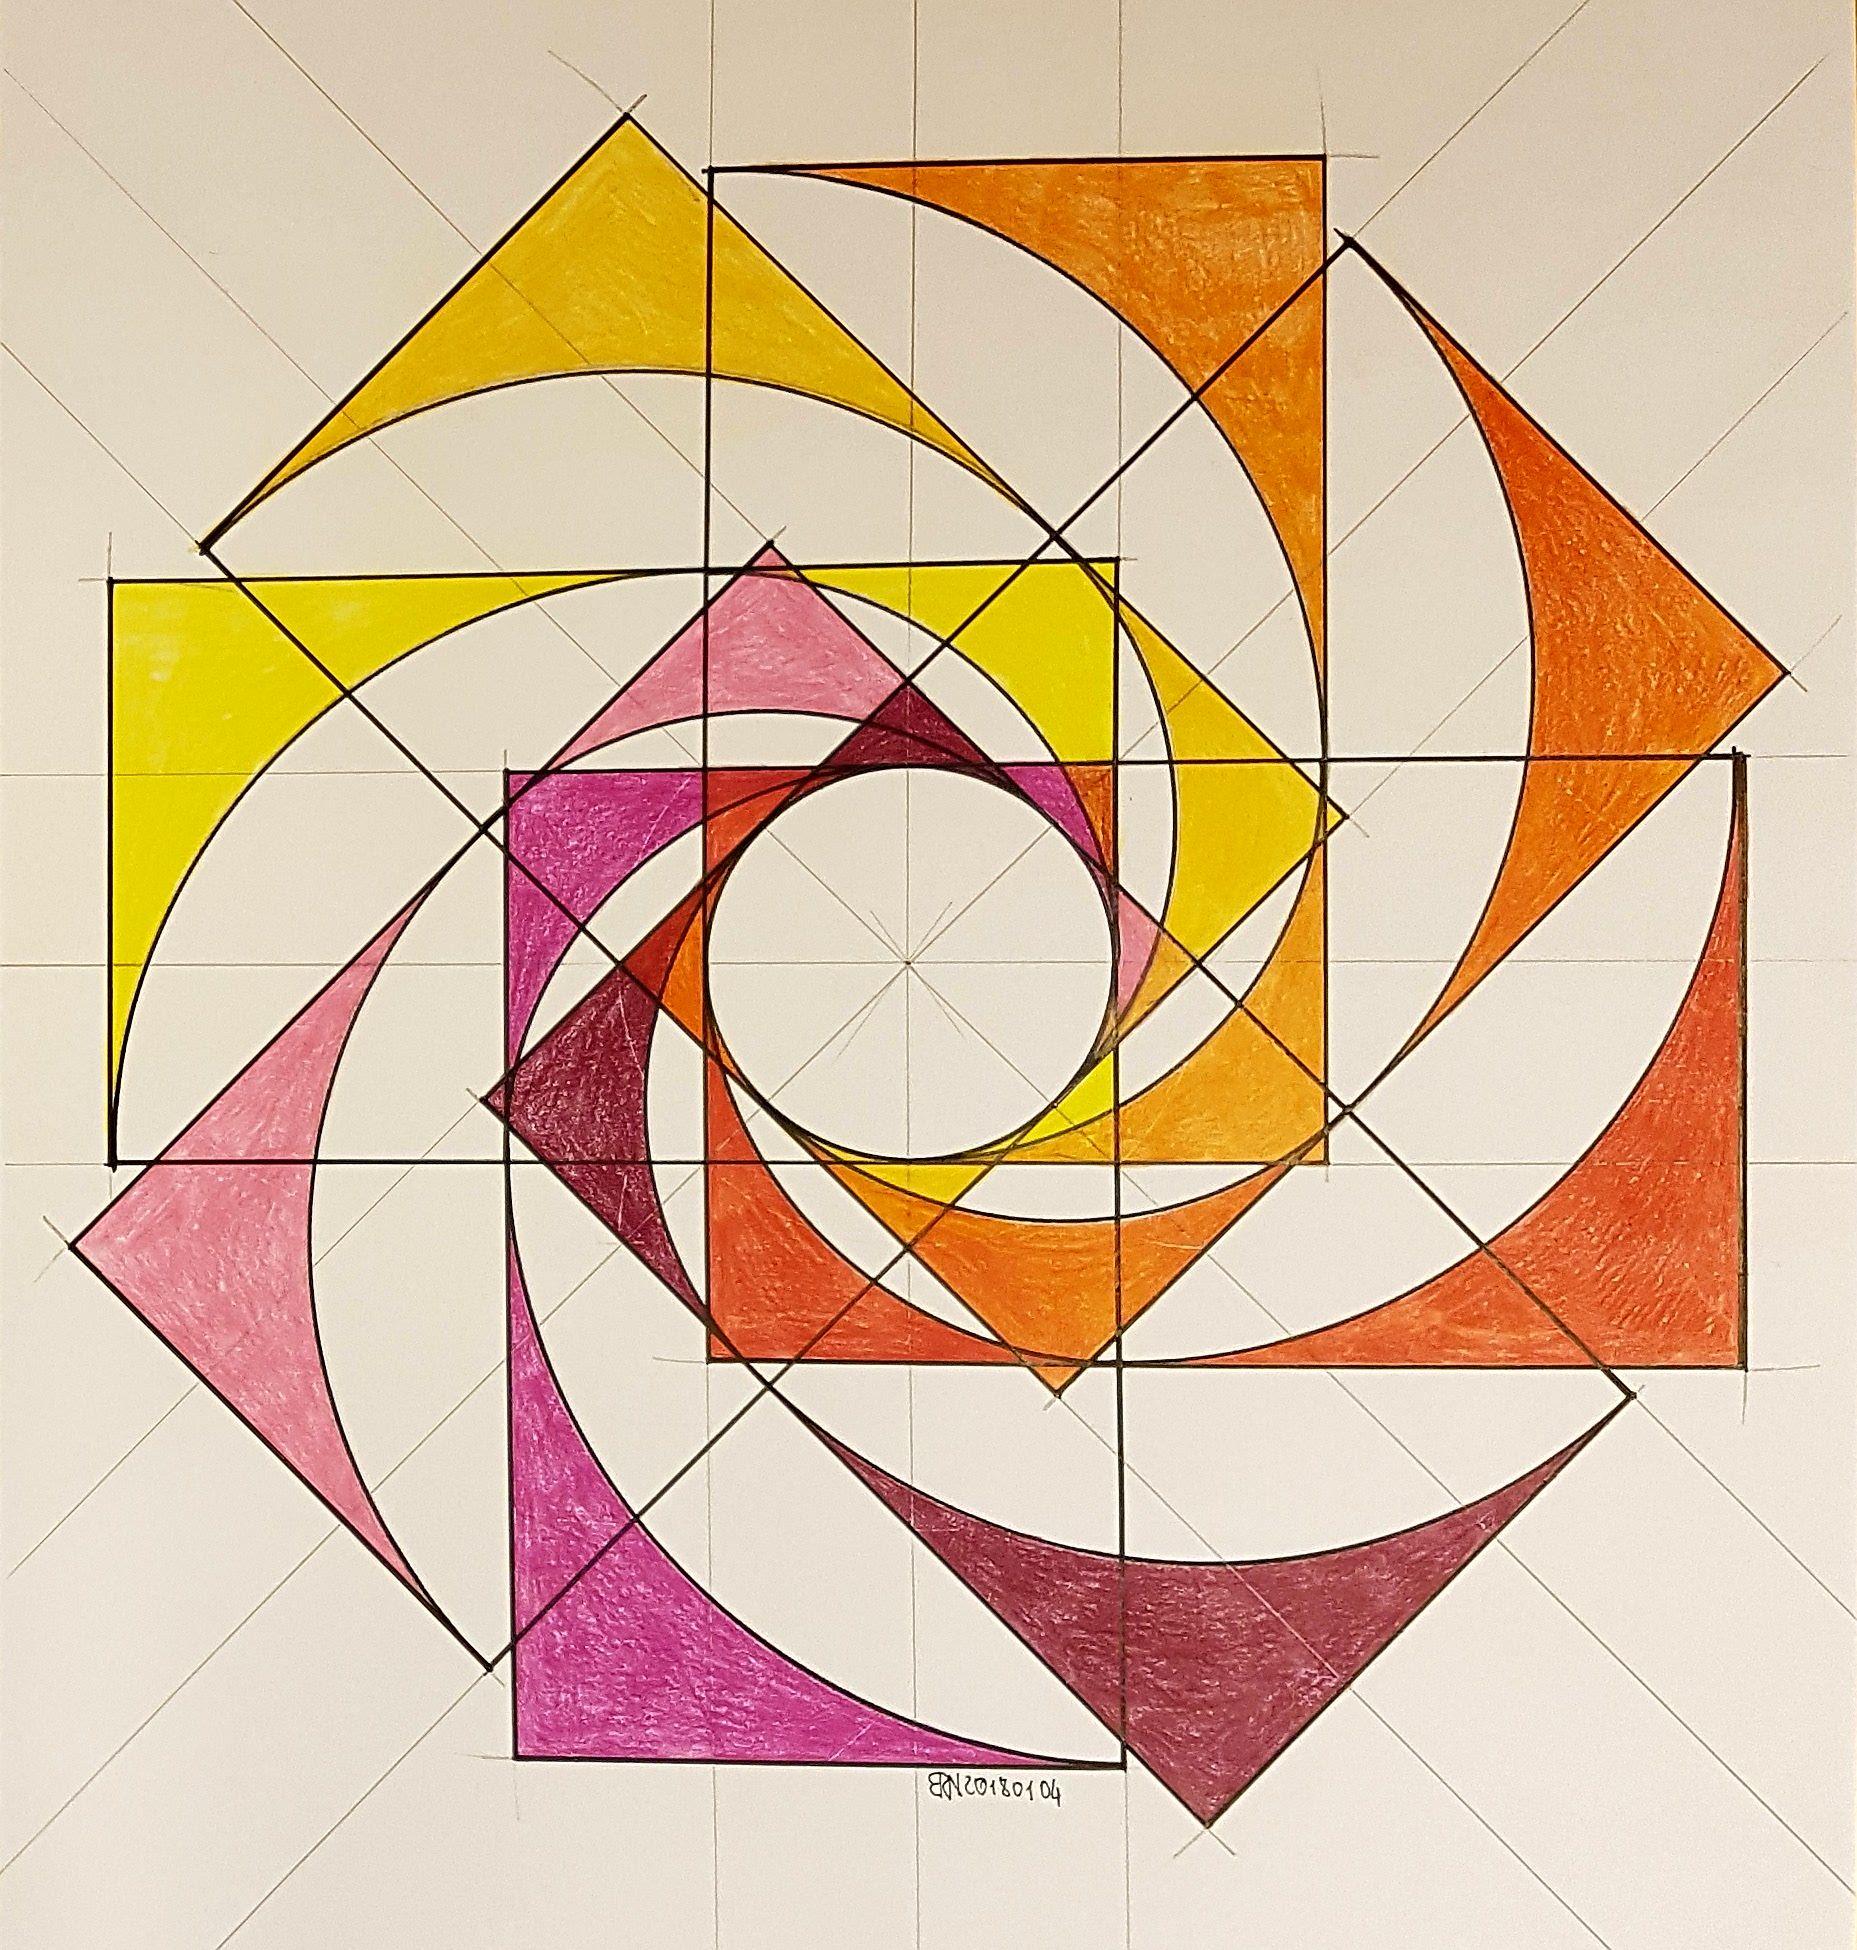 hyperbolic #geometry #symmetry #mathart #regolo54 #circle #disk